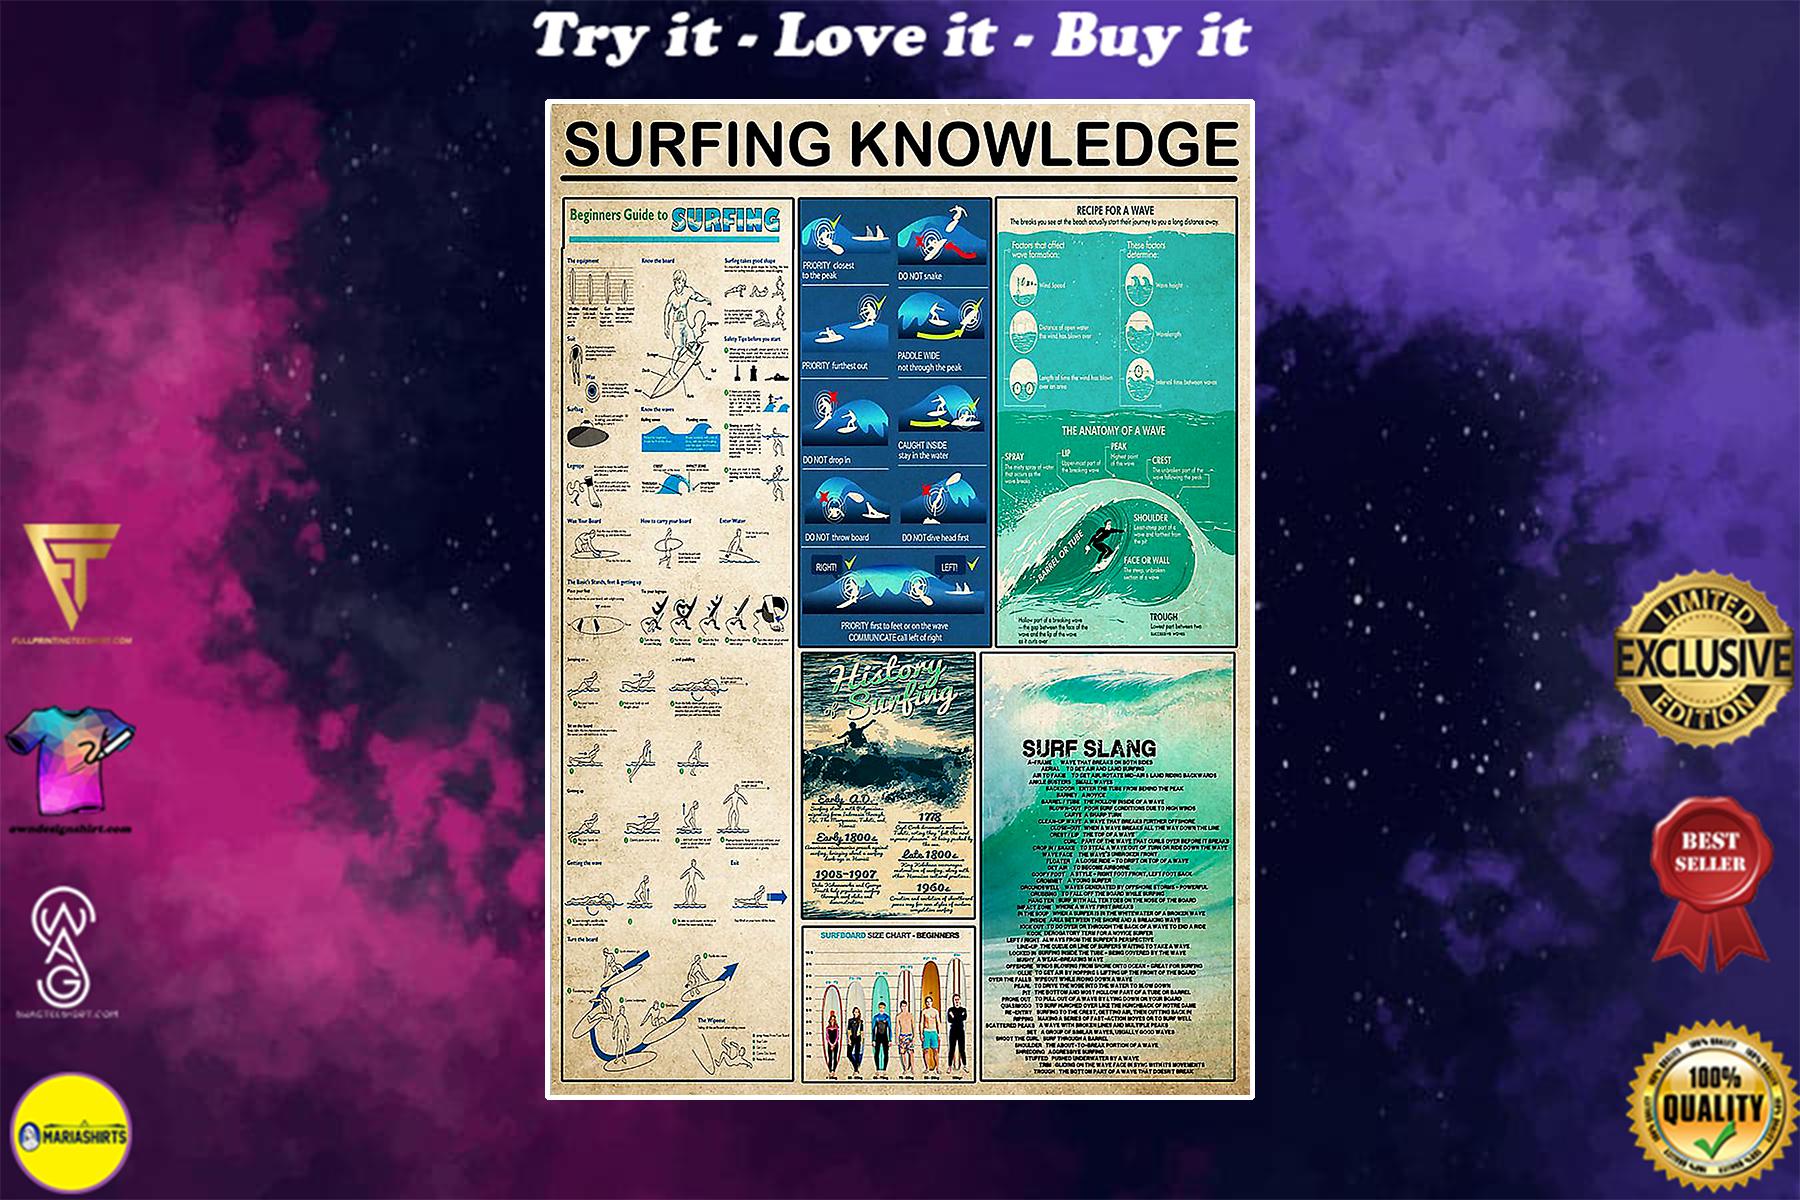 surfing knowledge vintage poster